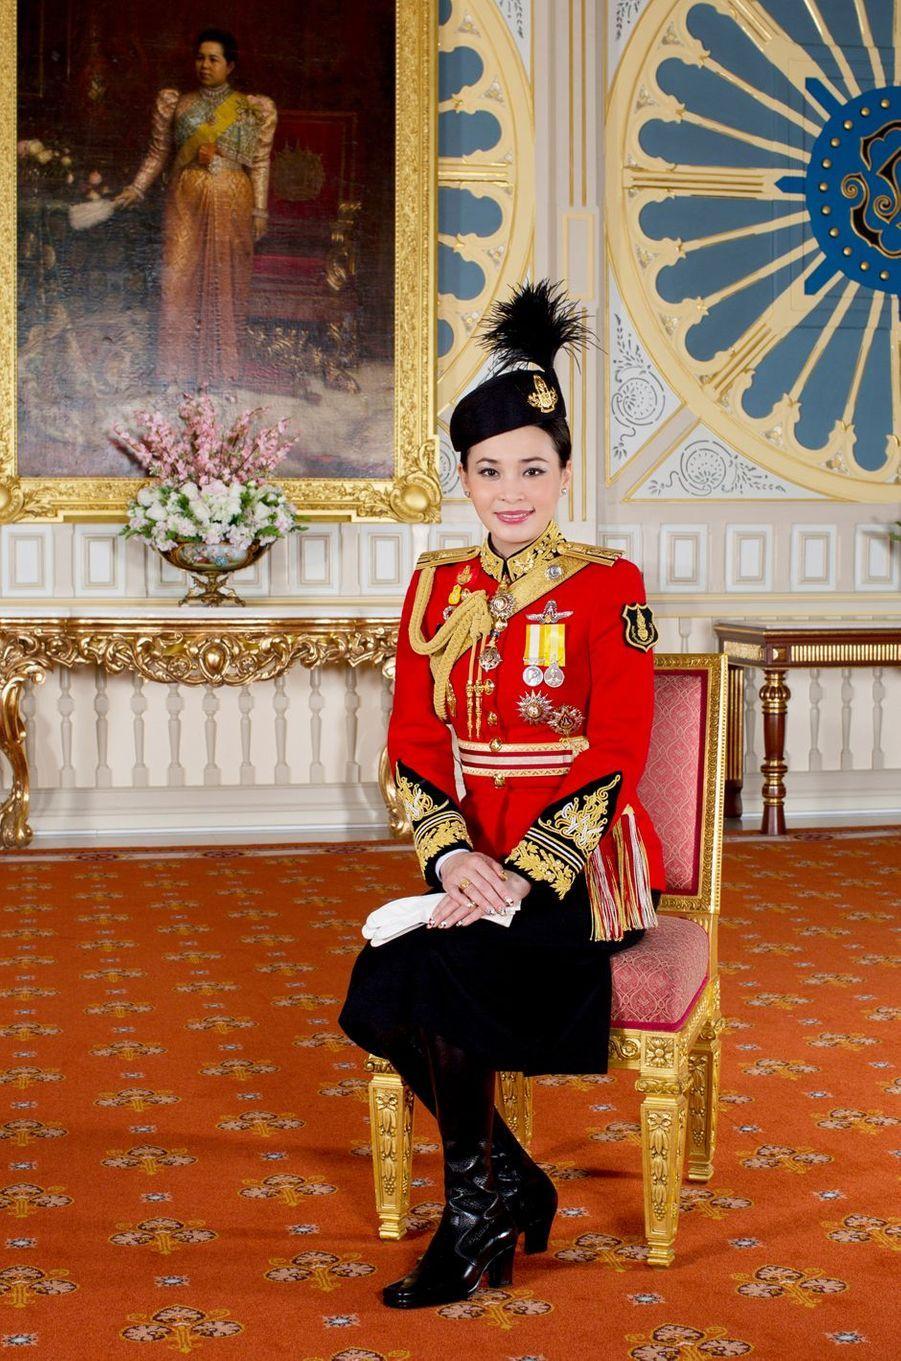 La reine consort Suthida de Thaïlande, épouse du roi Maha Vajiralongkorn (Rama X). Portrait diffusé le 17 mai 2019